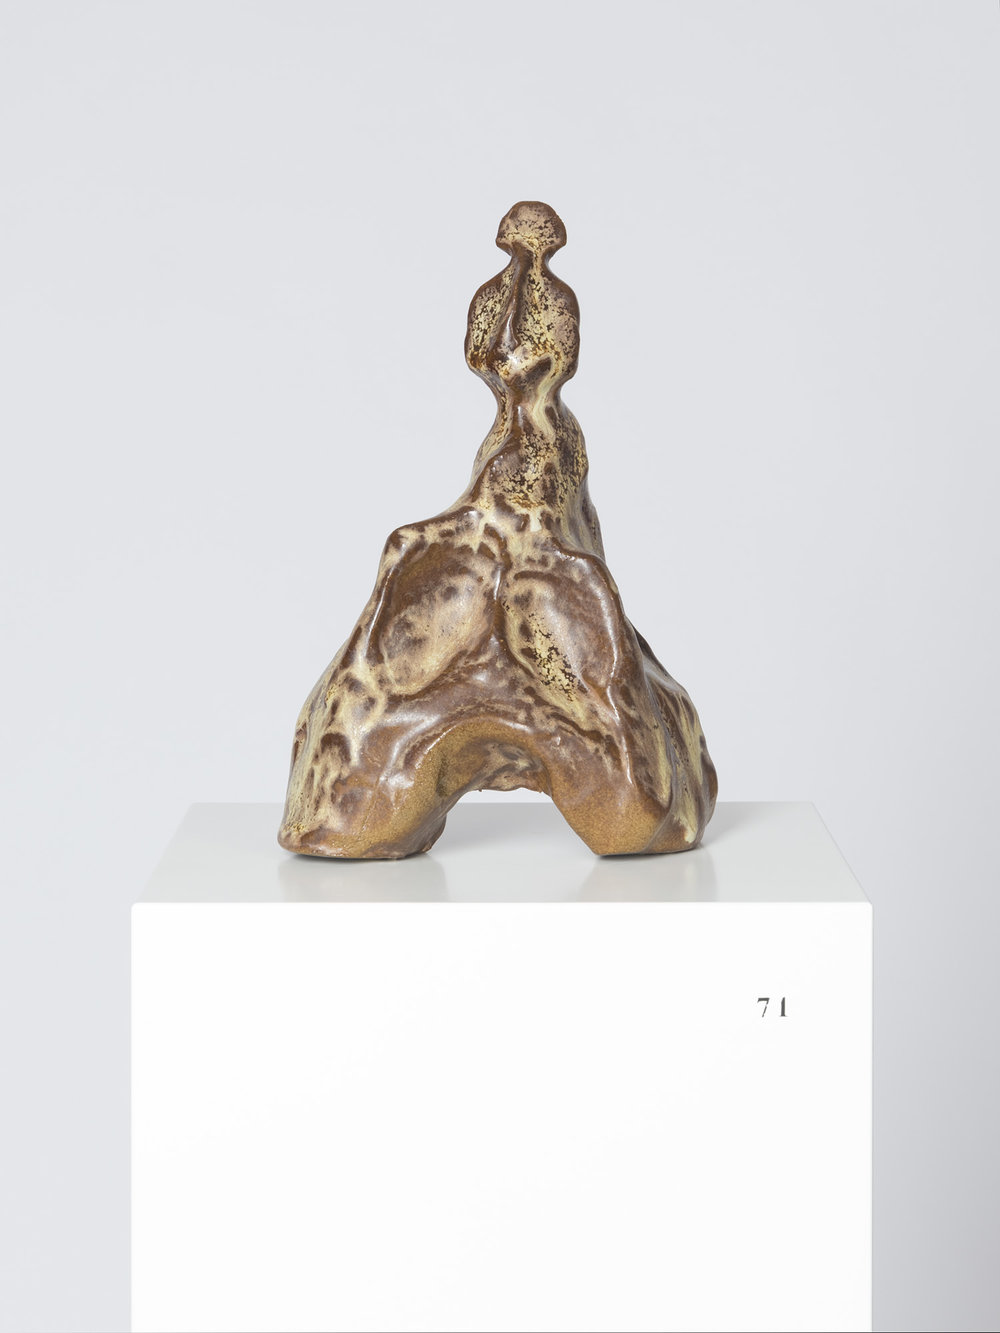 Sanupäerkopf , ca. 400 v. Chr.  glazed ceramic  21 × 13 × 9 cm